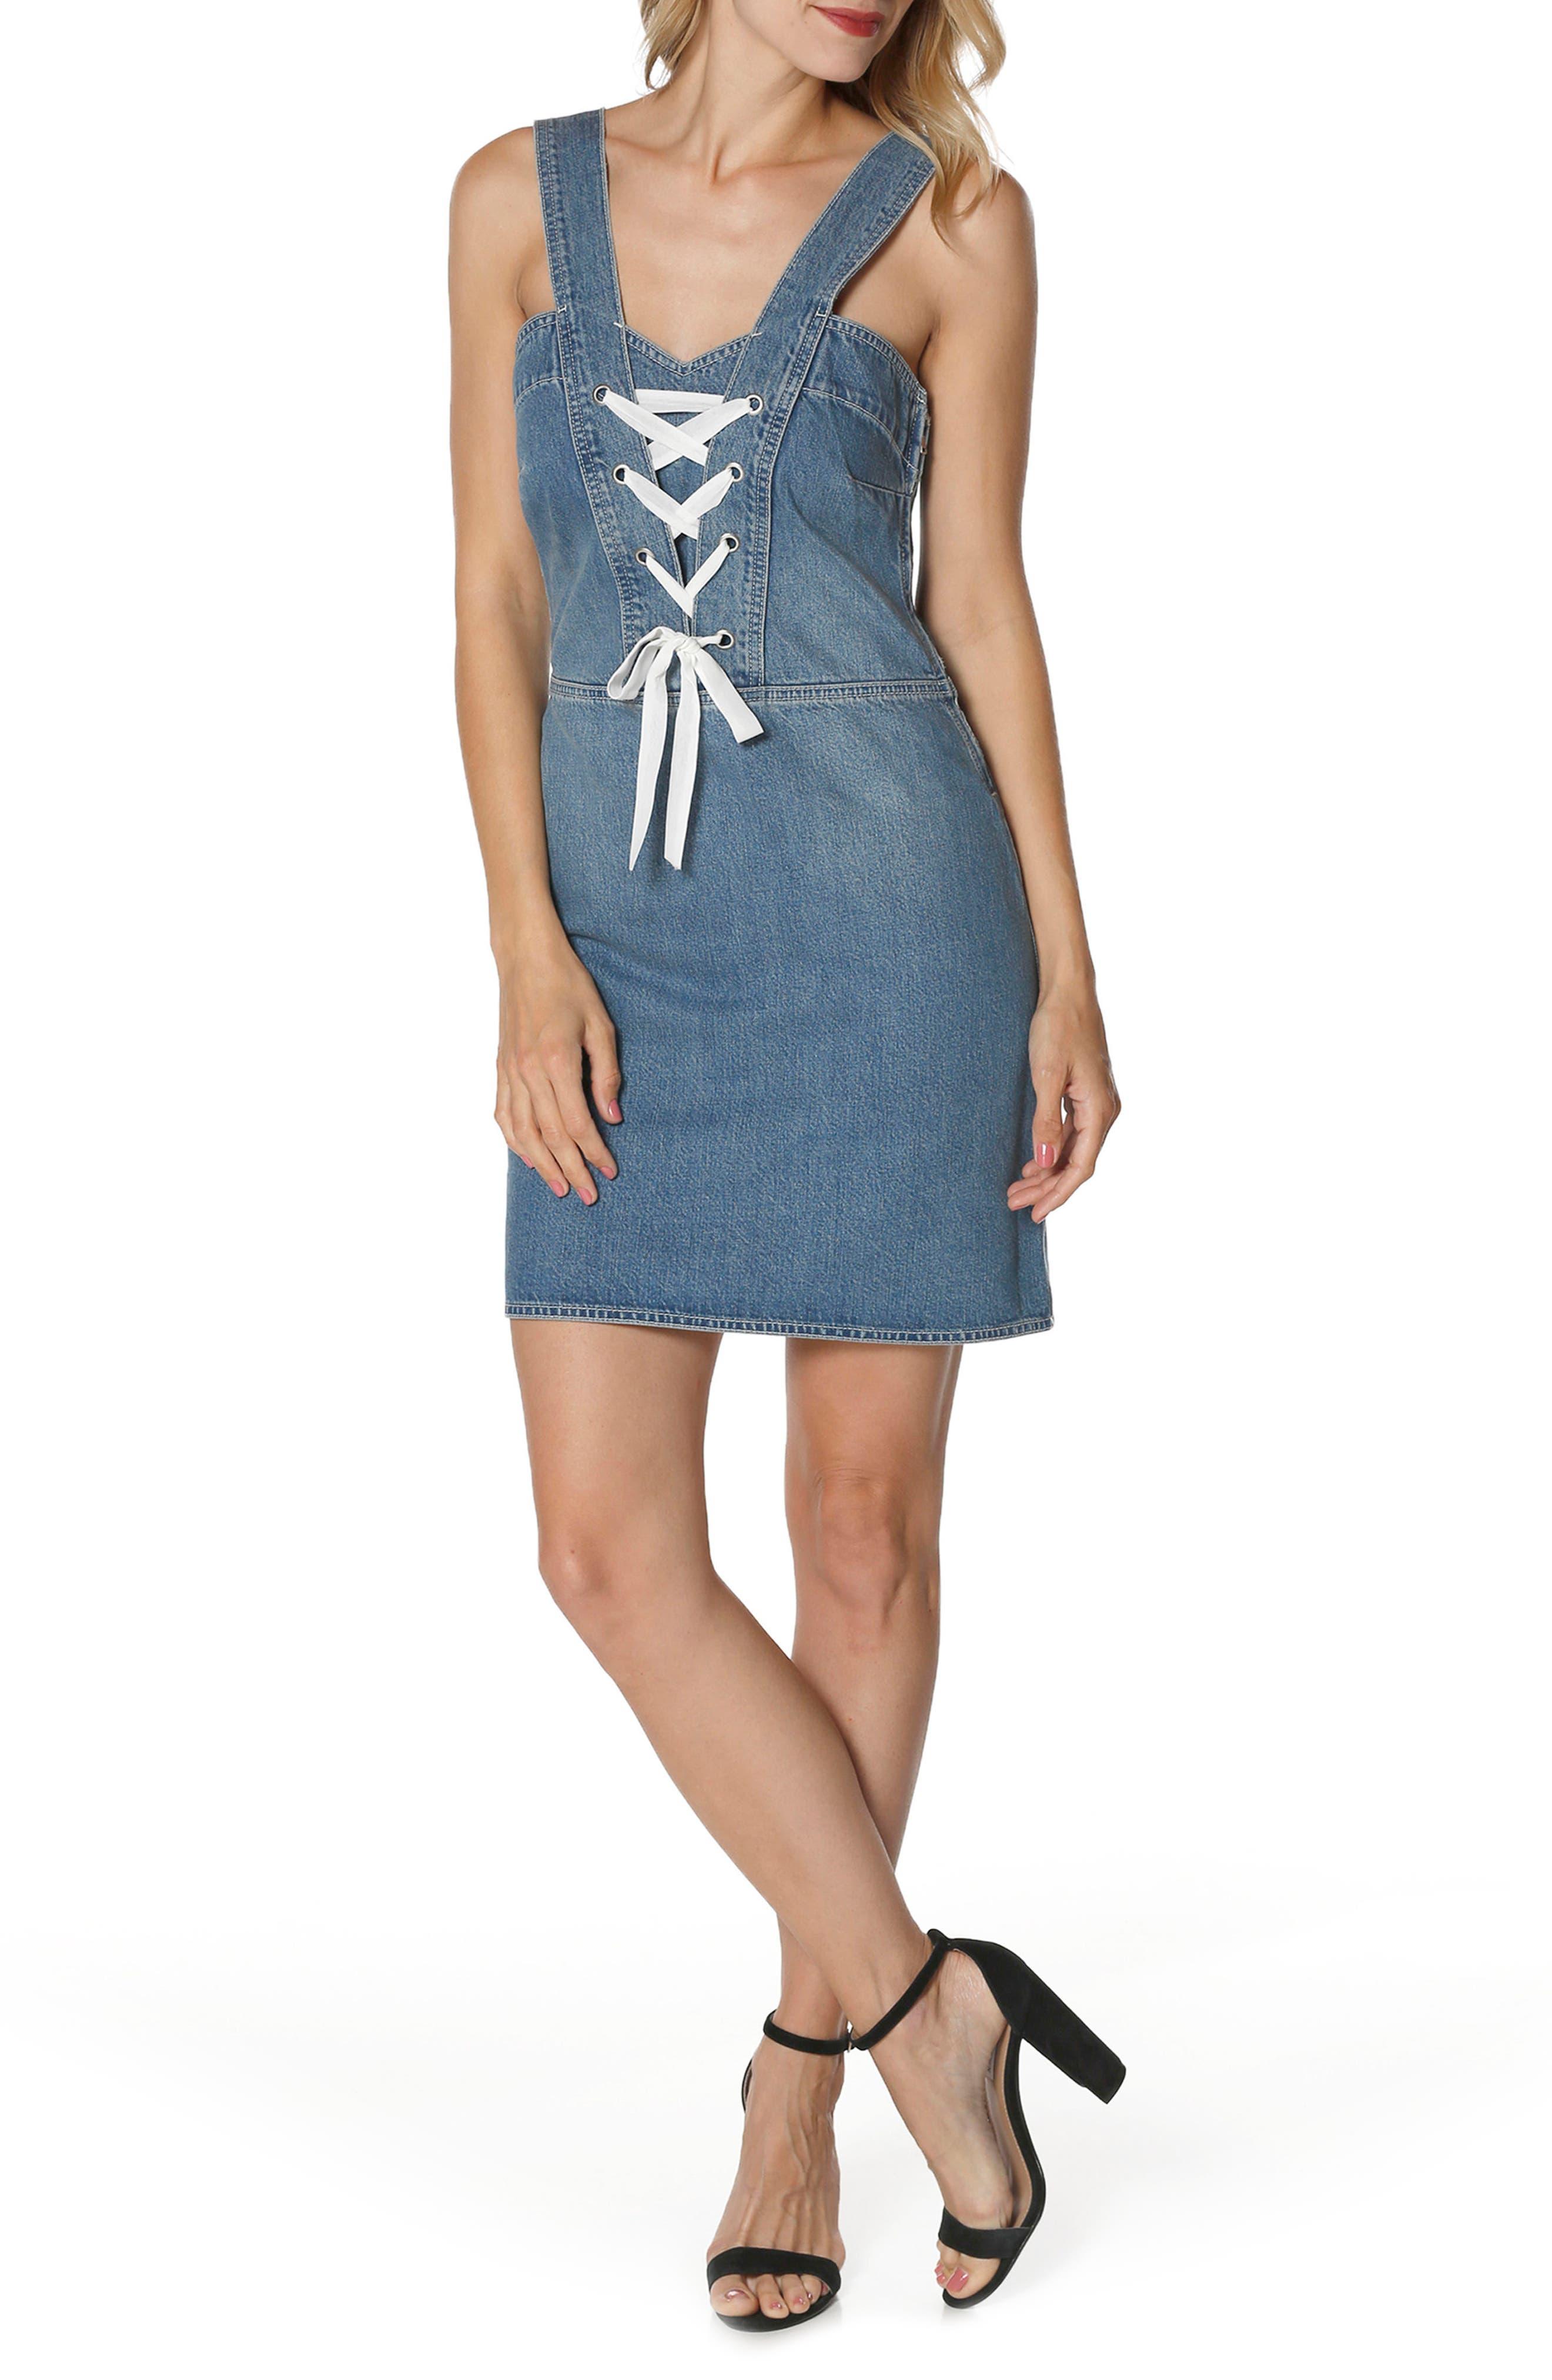 Tula Lace-Up Denim Dress,                             Main thumbnail 1, color,                             Nolita